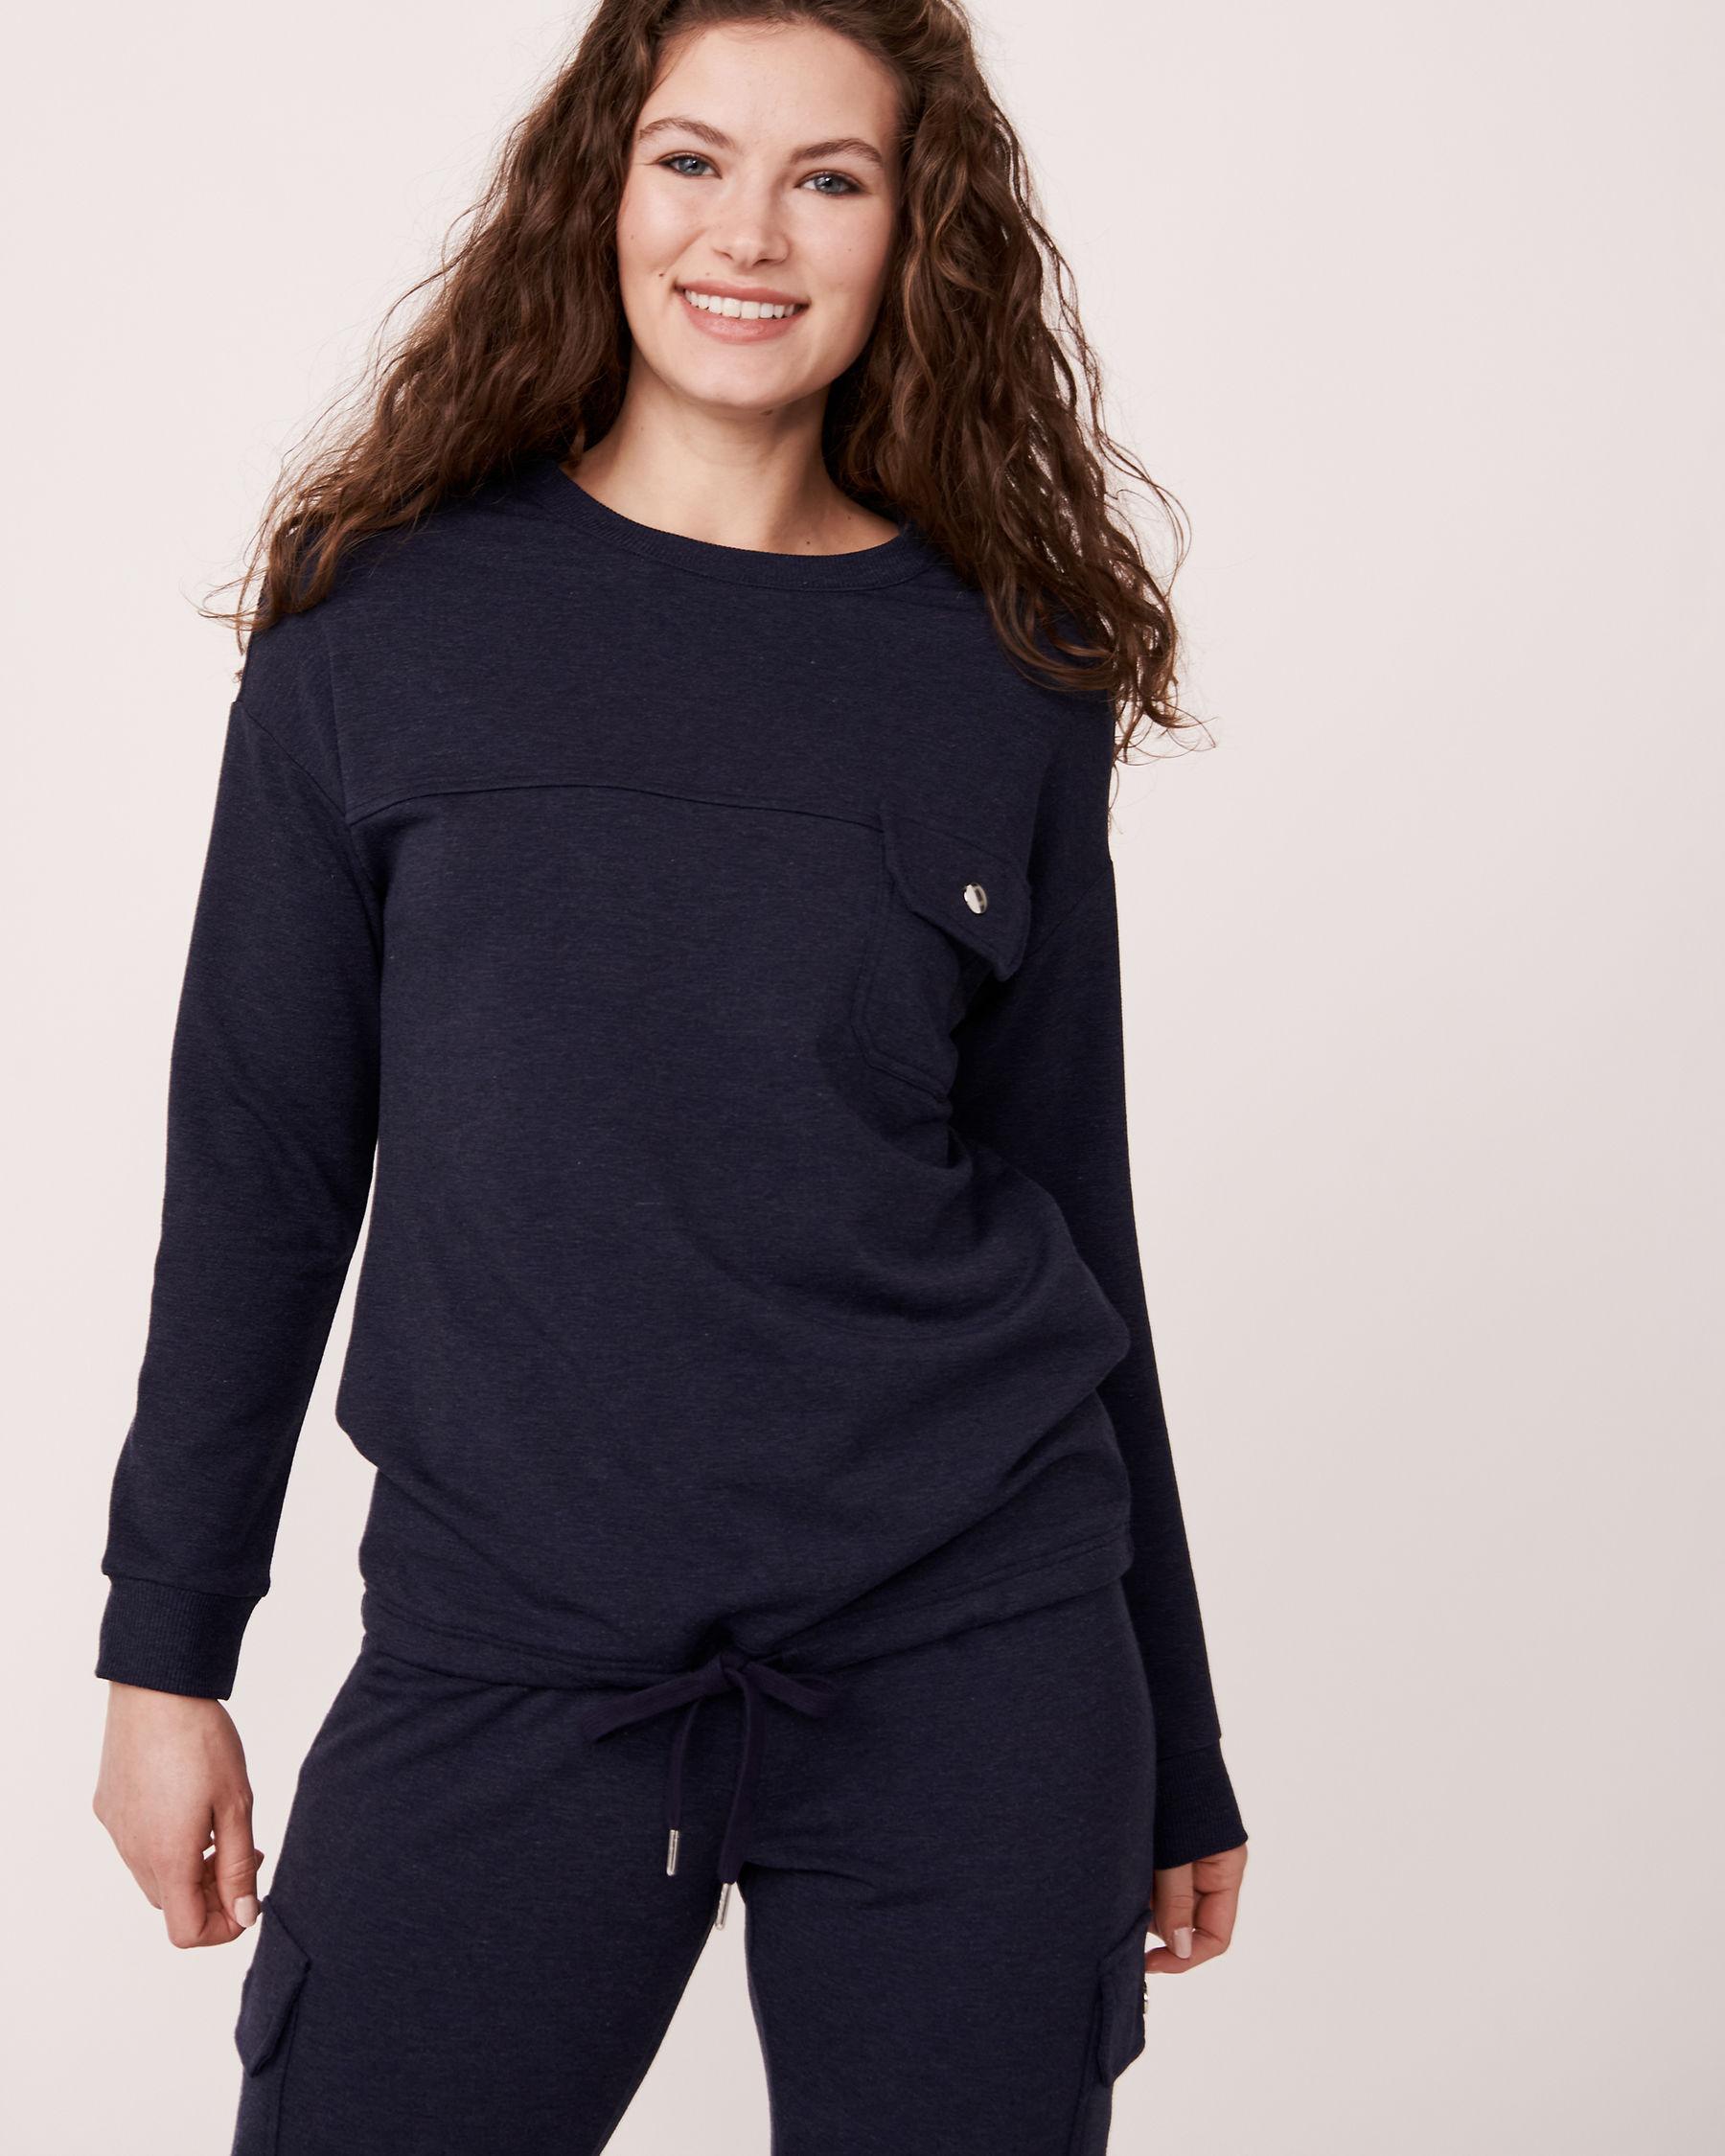 LA VIE EN ROSE Patch Pocket Long Sleeve Shirt Blue 50100004 - View1